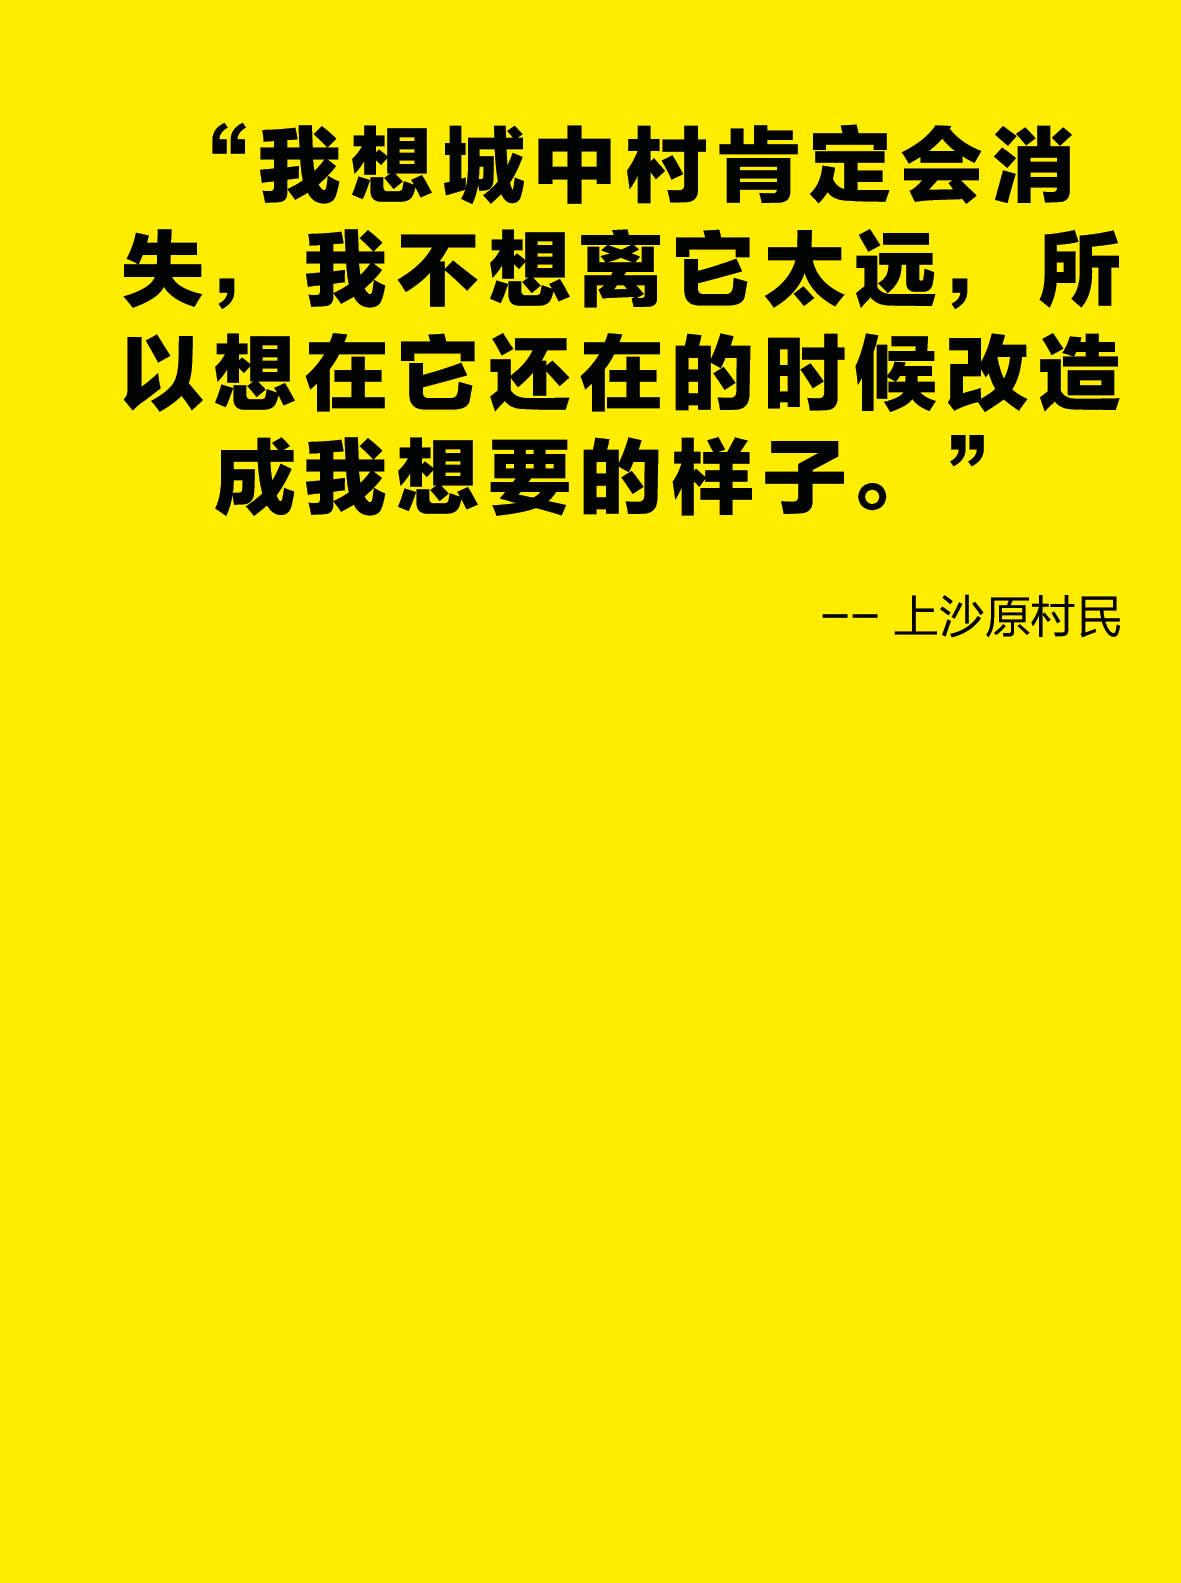 20180106_Shangsha Quotes test038.jpg